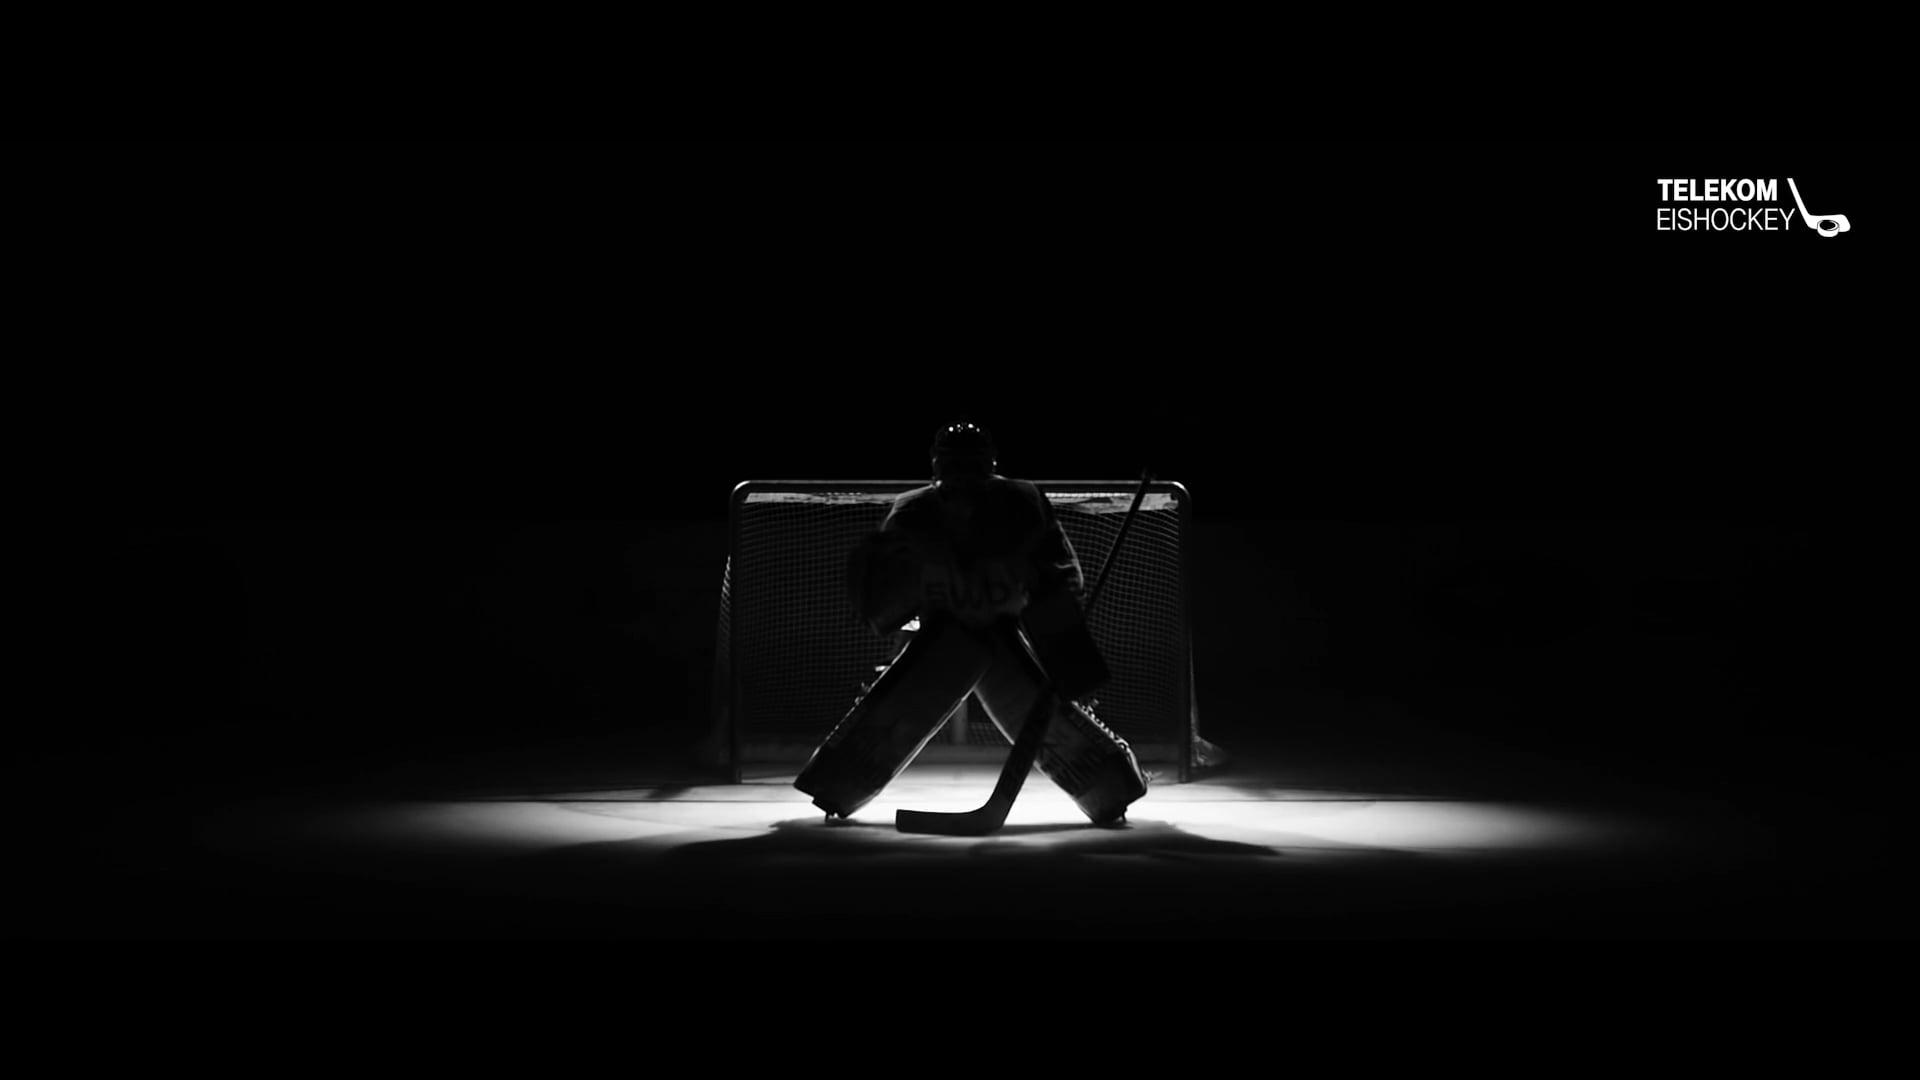 Telekom Eishockey TVC 16/17